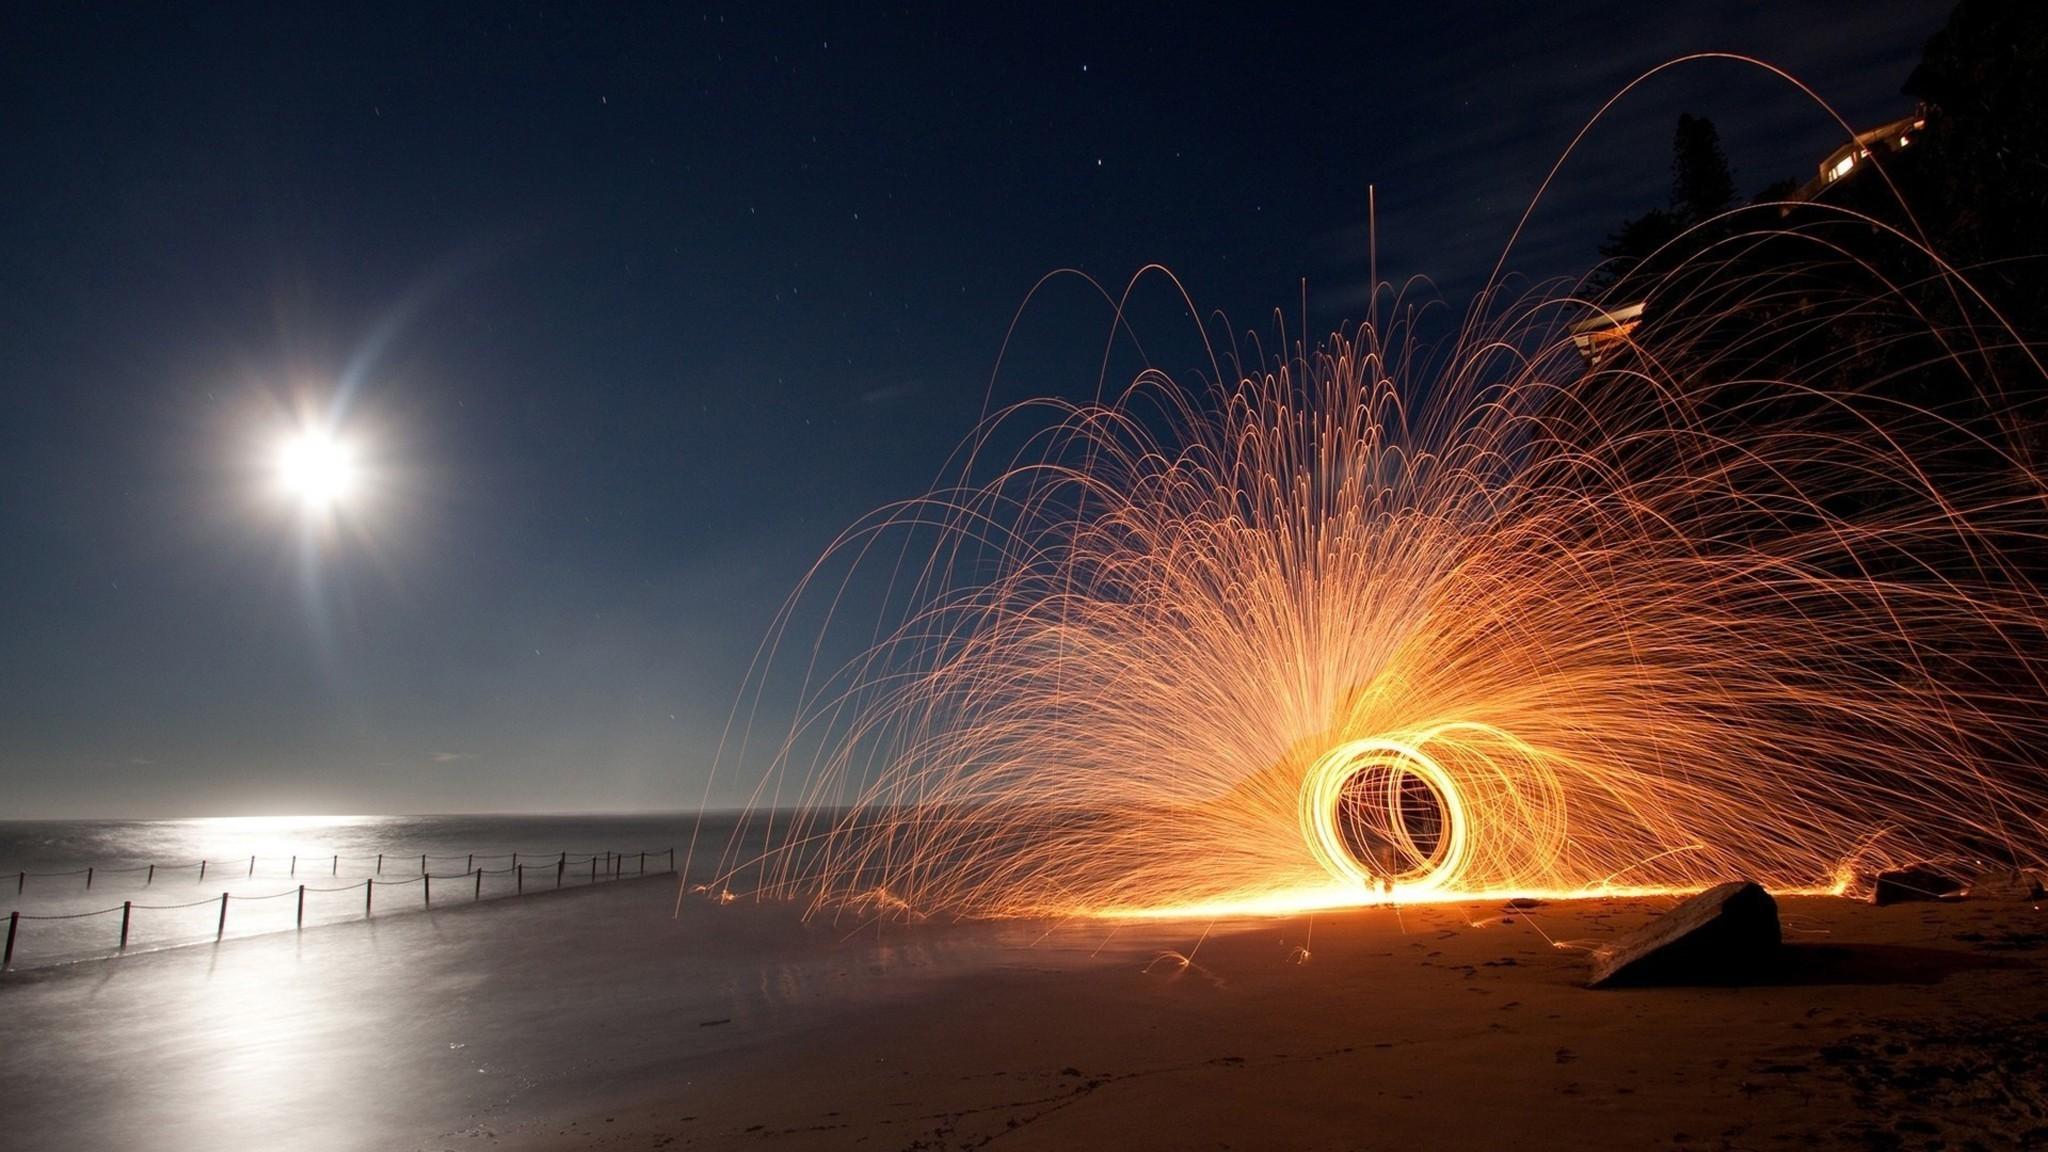 Beach At Night Desktop Images.